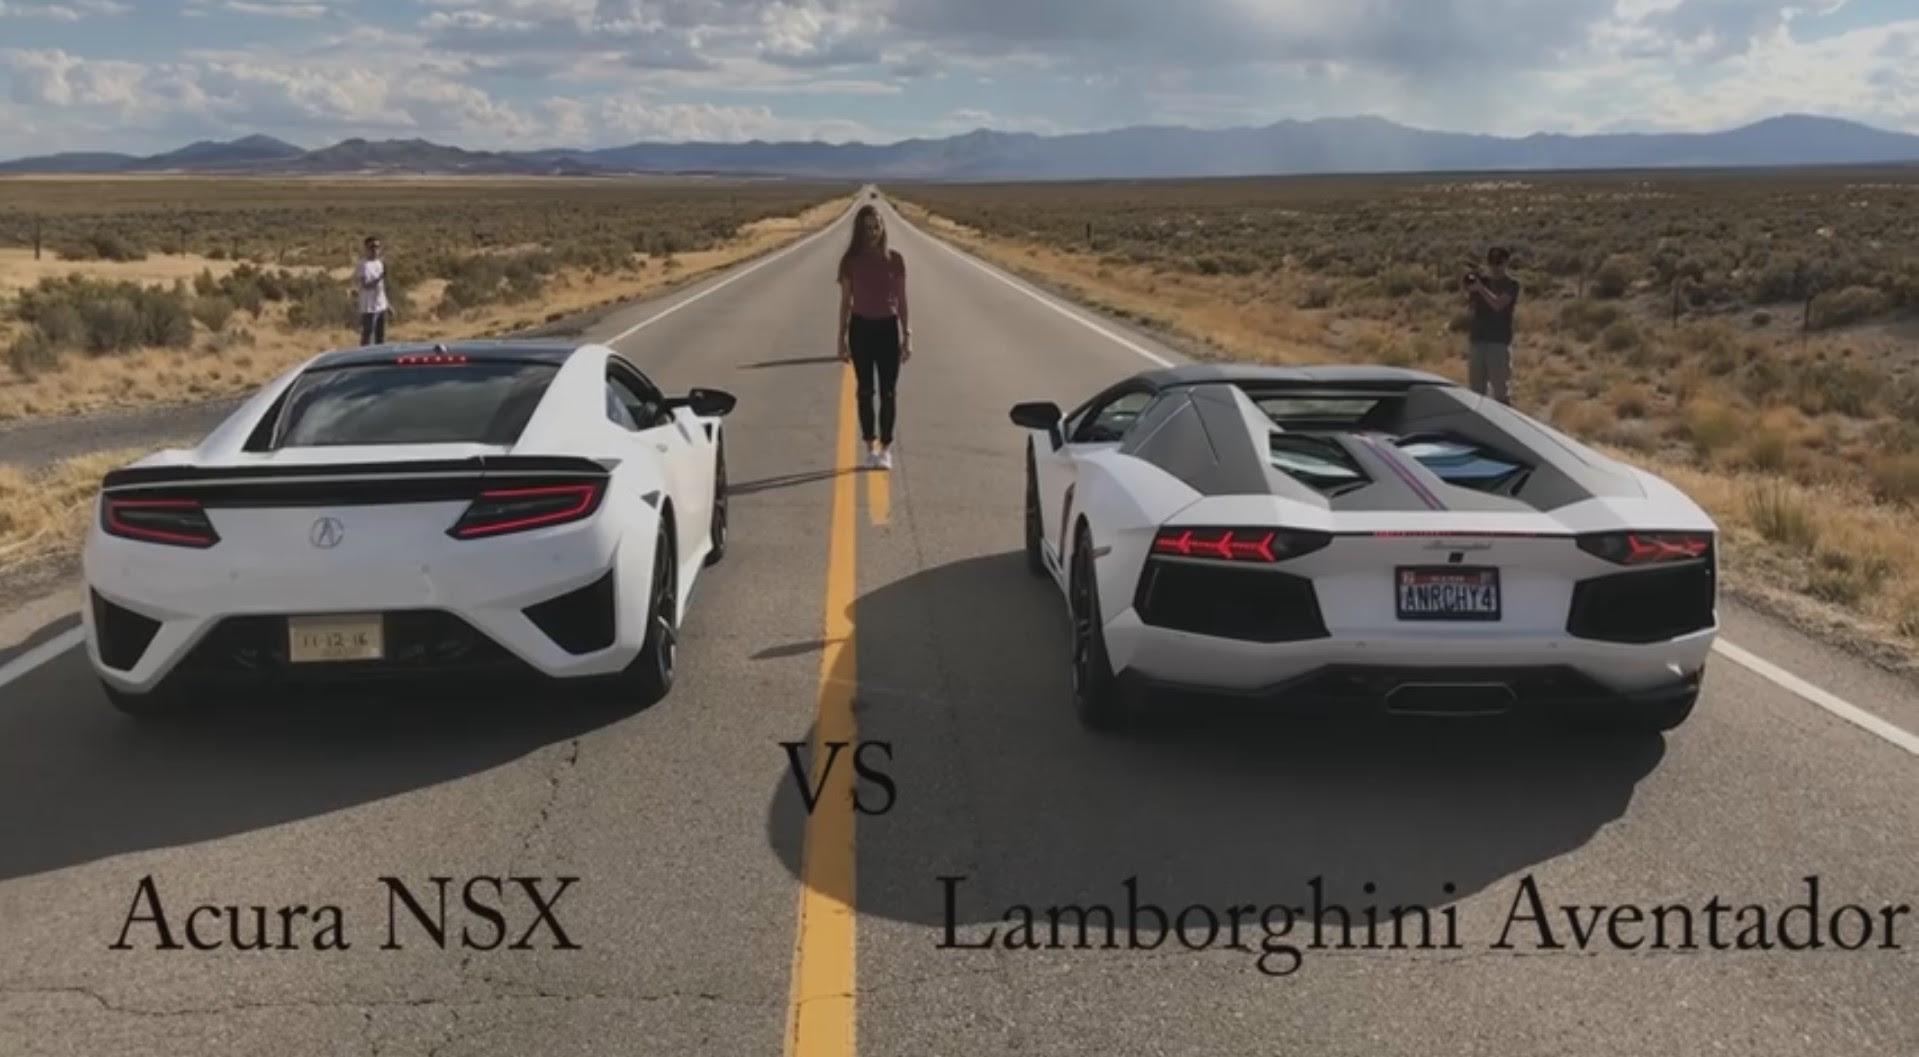 Acura NSX bests Lamborghini Aventador in drag race